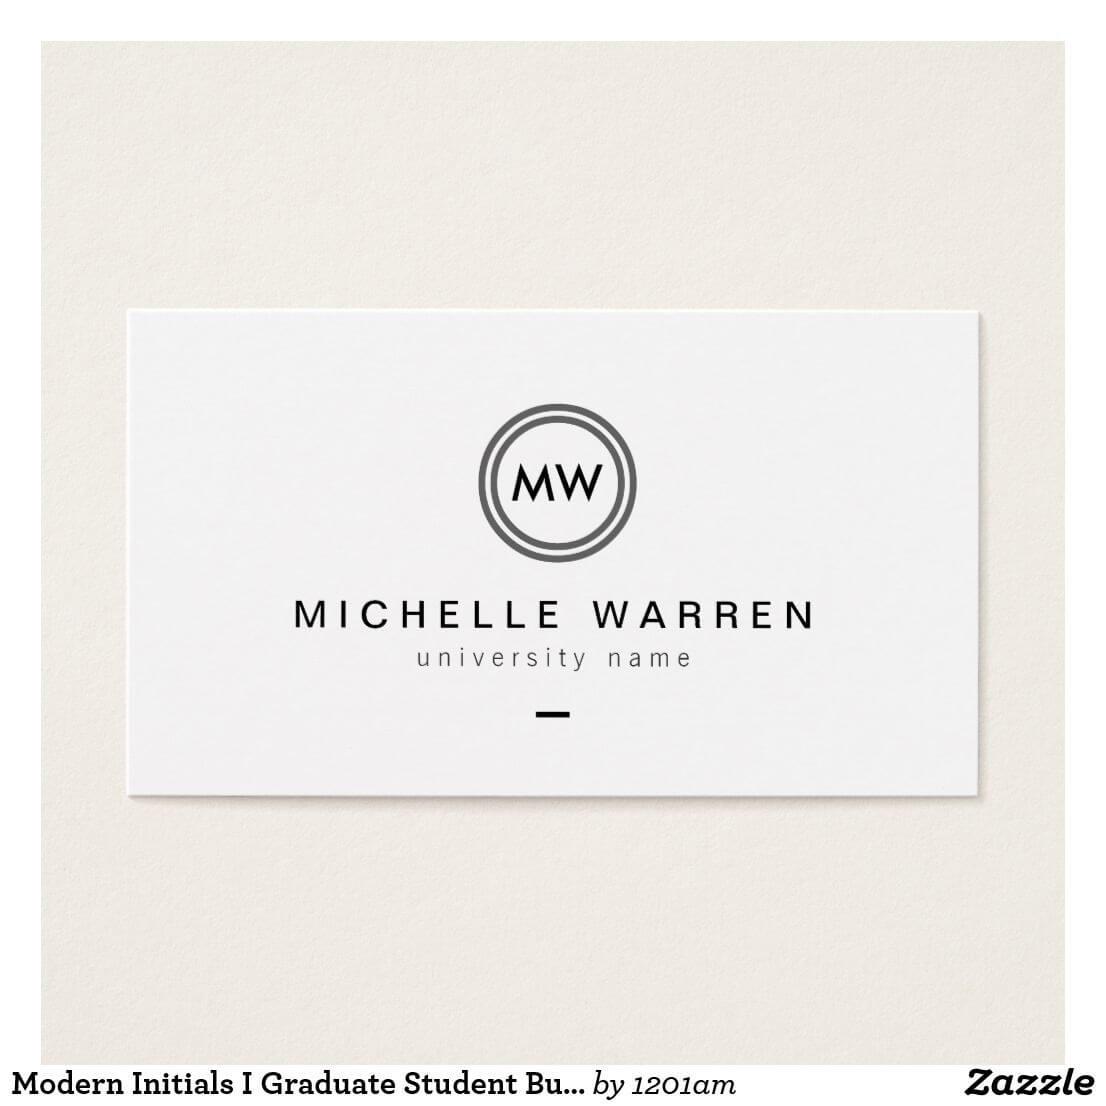 Modern Initials I Graduate Student Business Card   Zazzle Within Graduate Student Business Cards Template